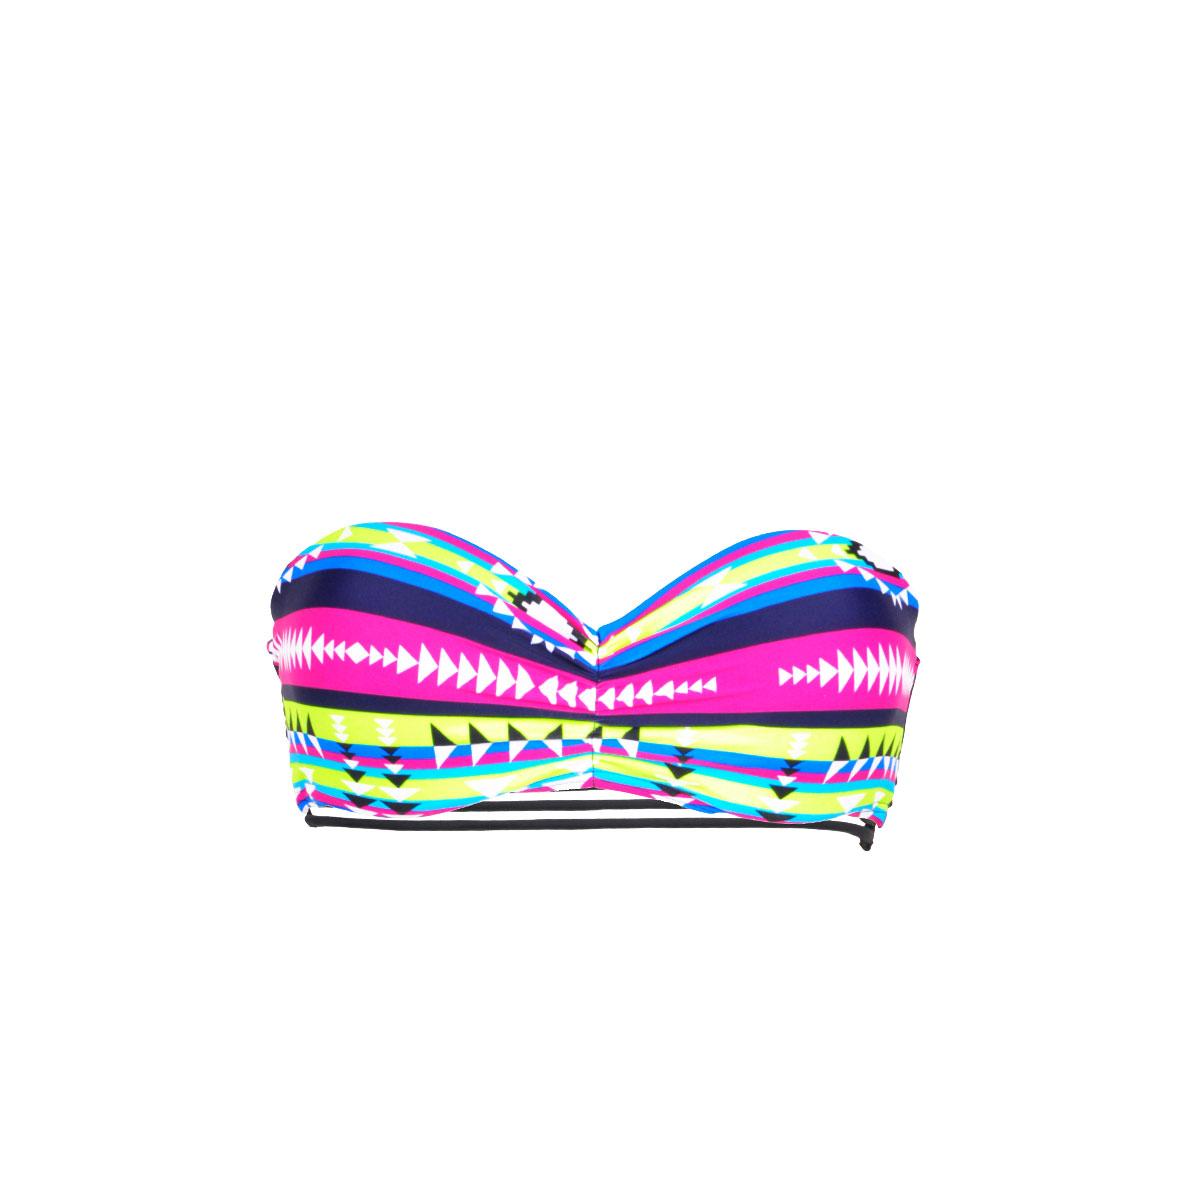 Mon Bandeau Teenie Bikini Azteken Muster bunt (Oberteil)